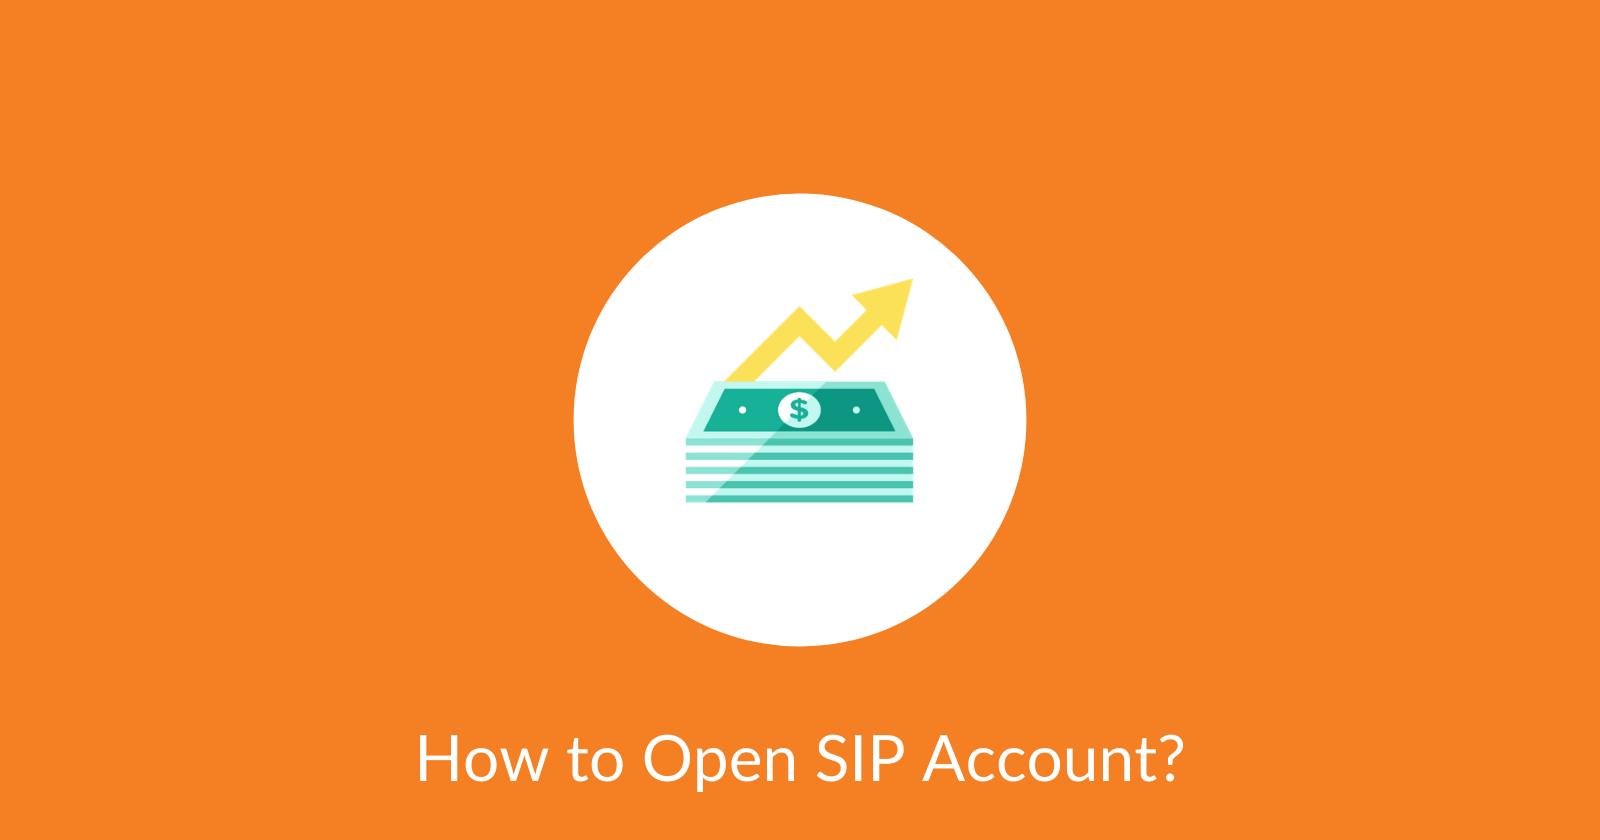 How to Open SIP Account